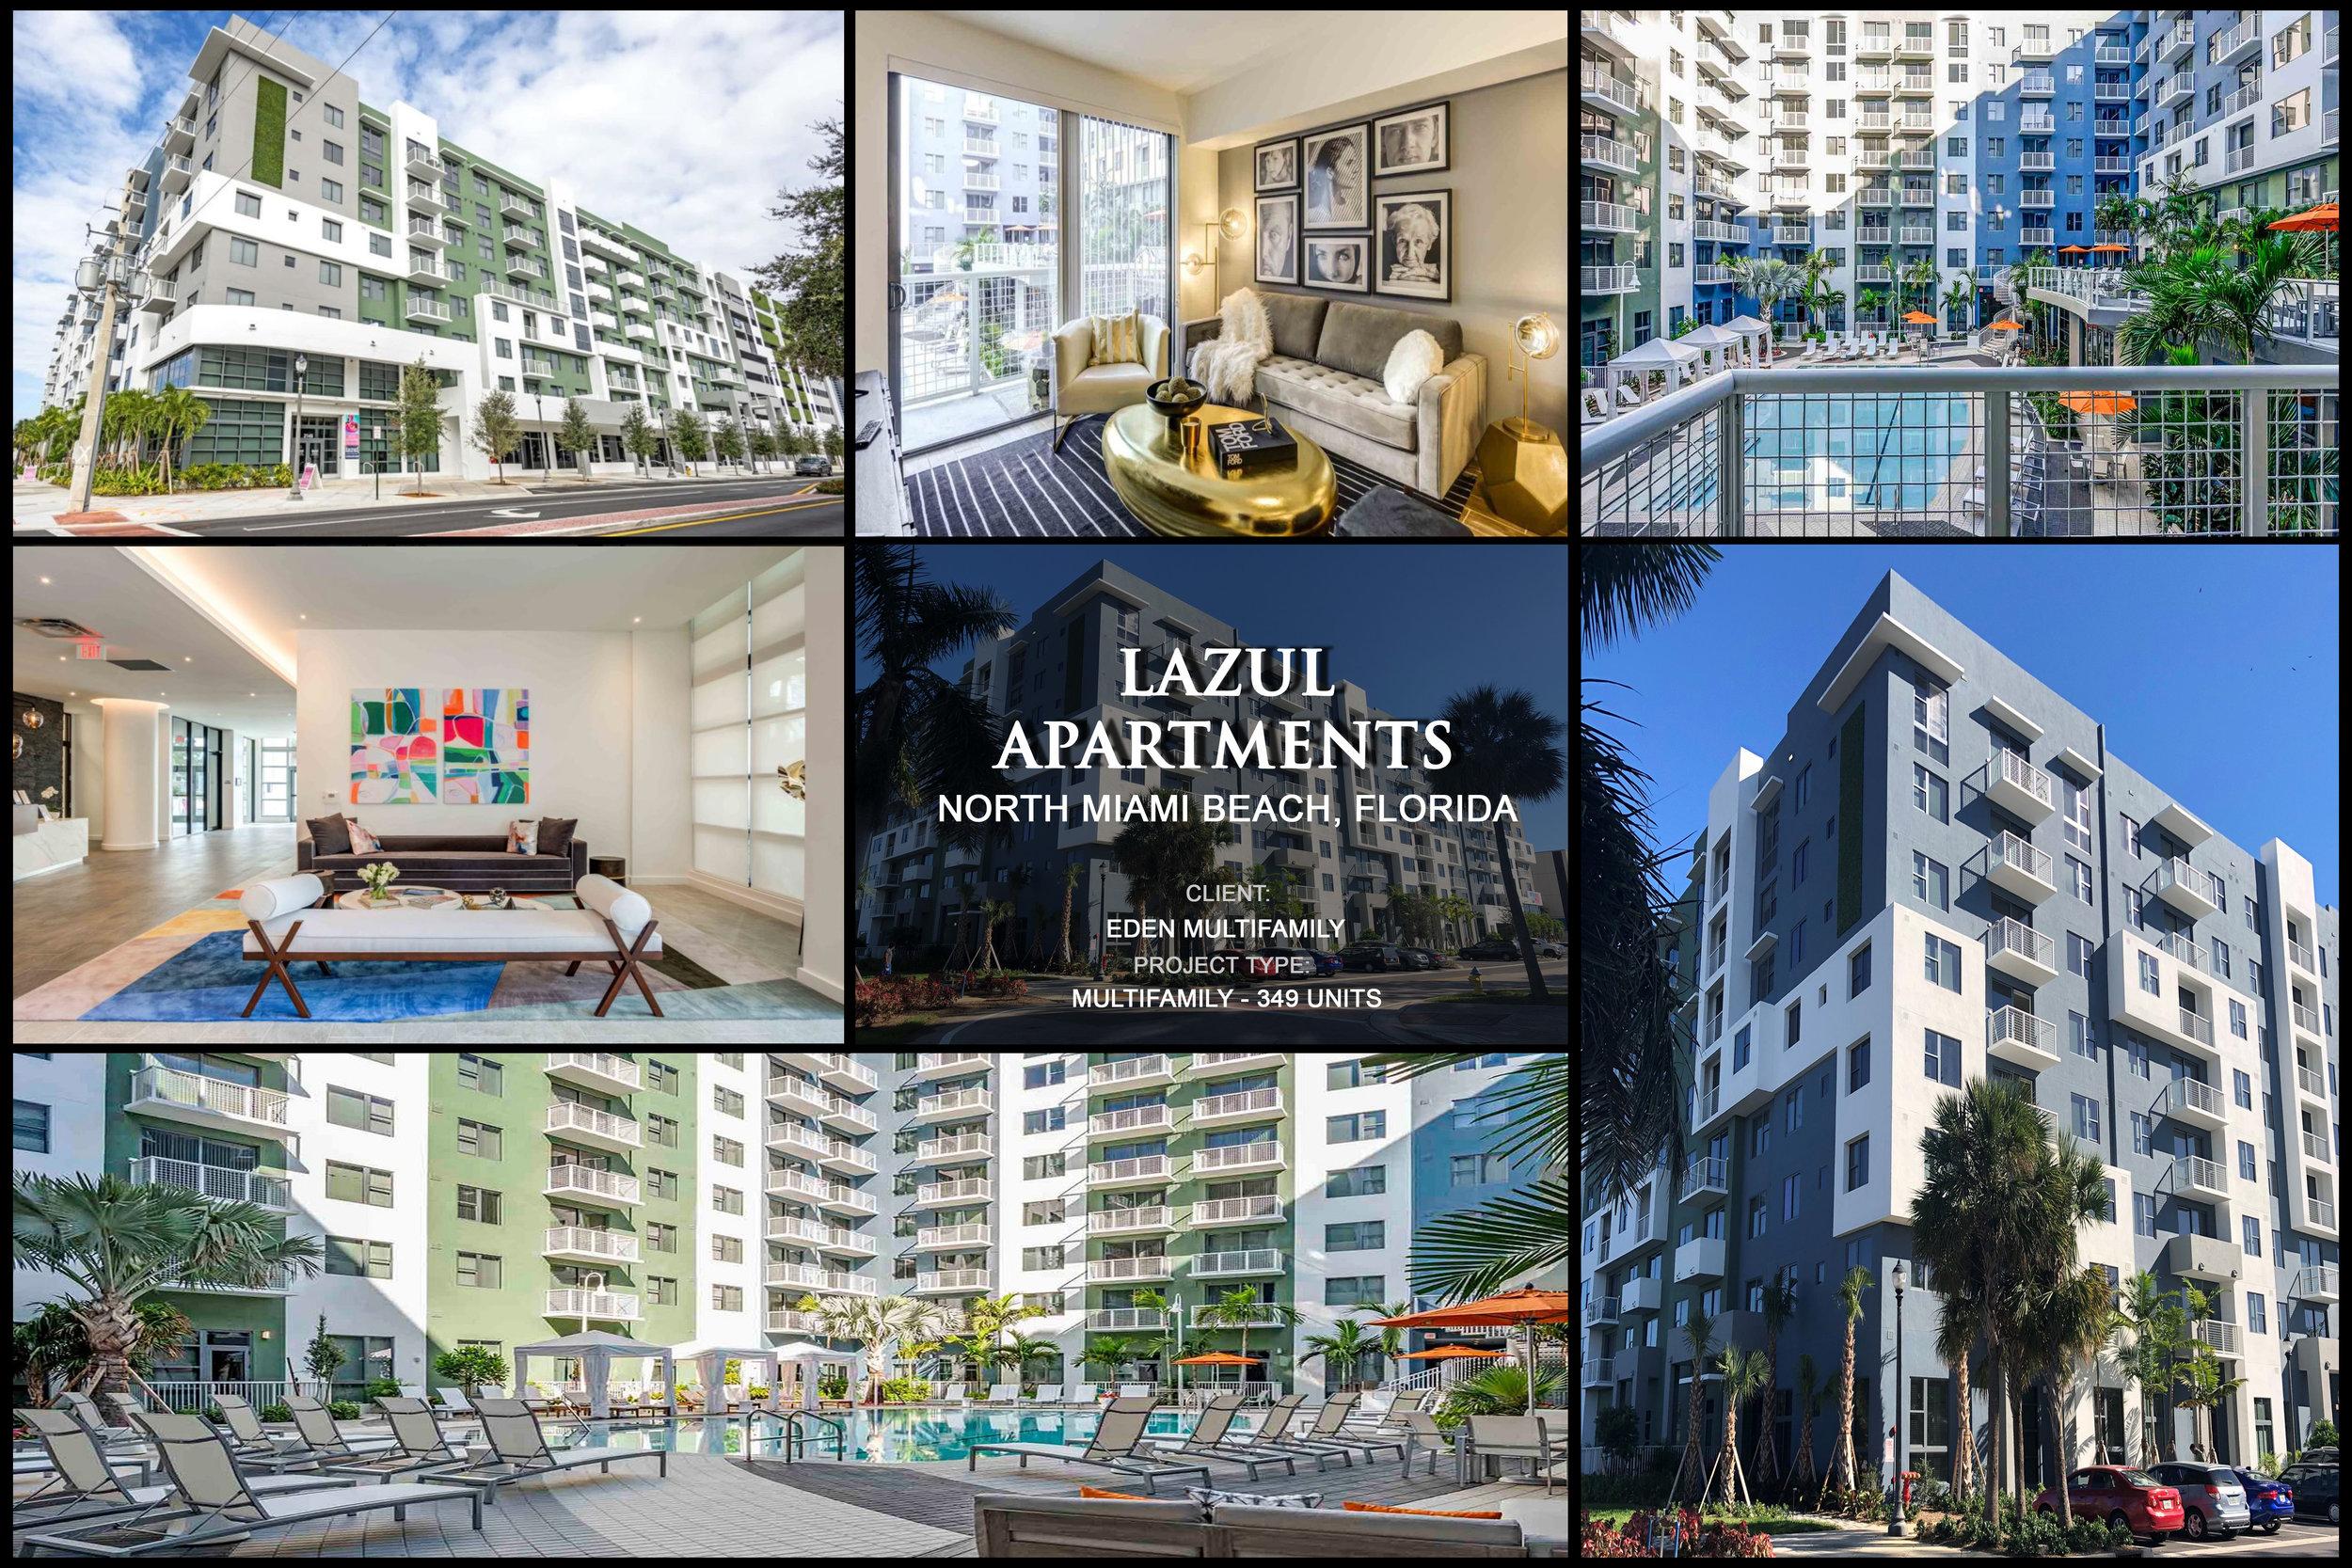 Lazul Apartments